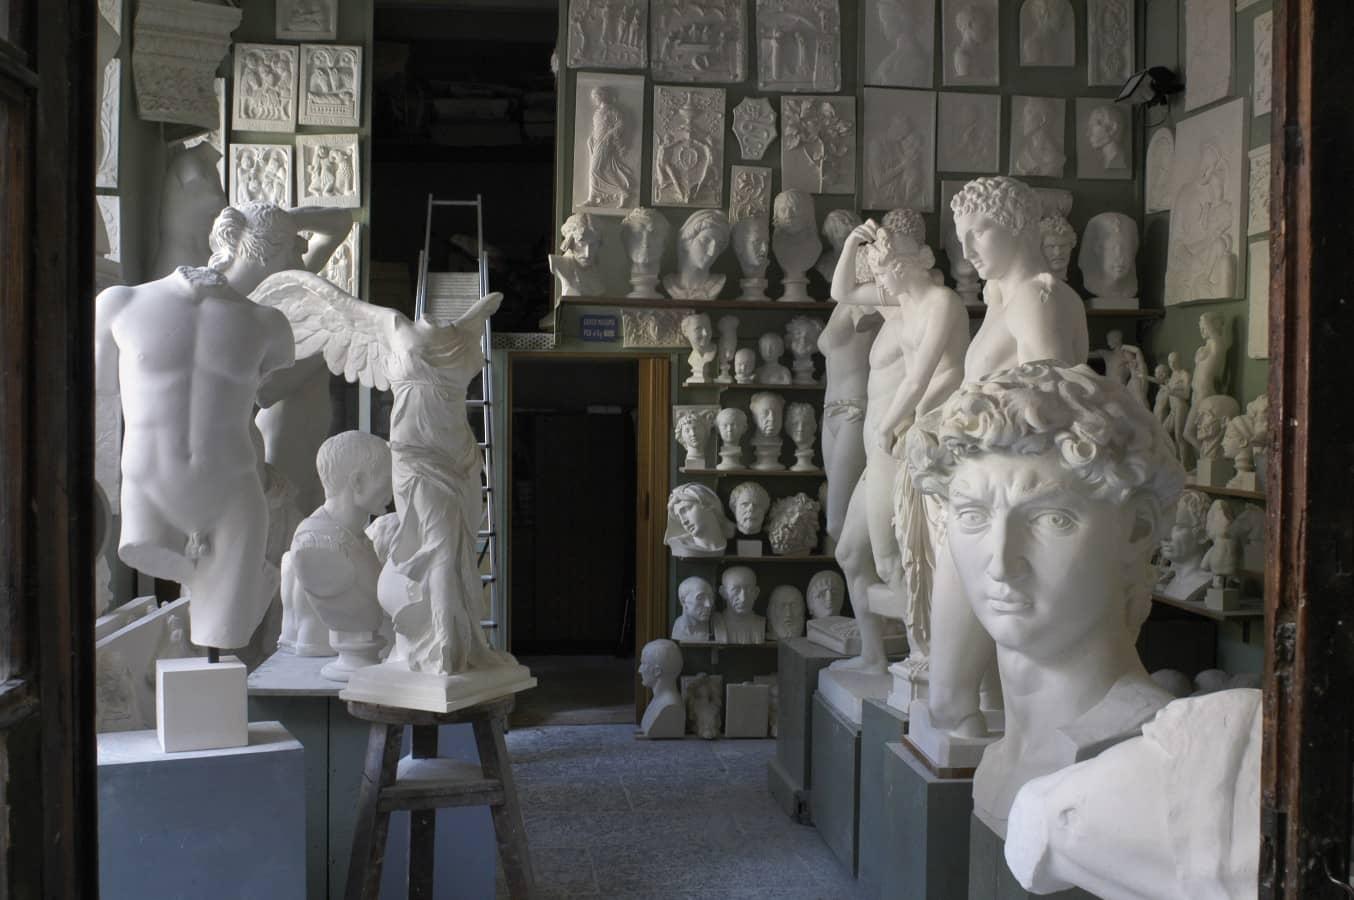 gipsoteca-fumagalli-e-dossi-artigiani-del-gesso-milano-thumbnail